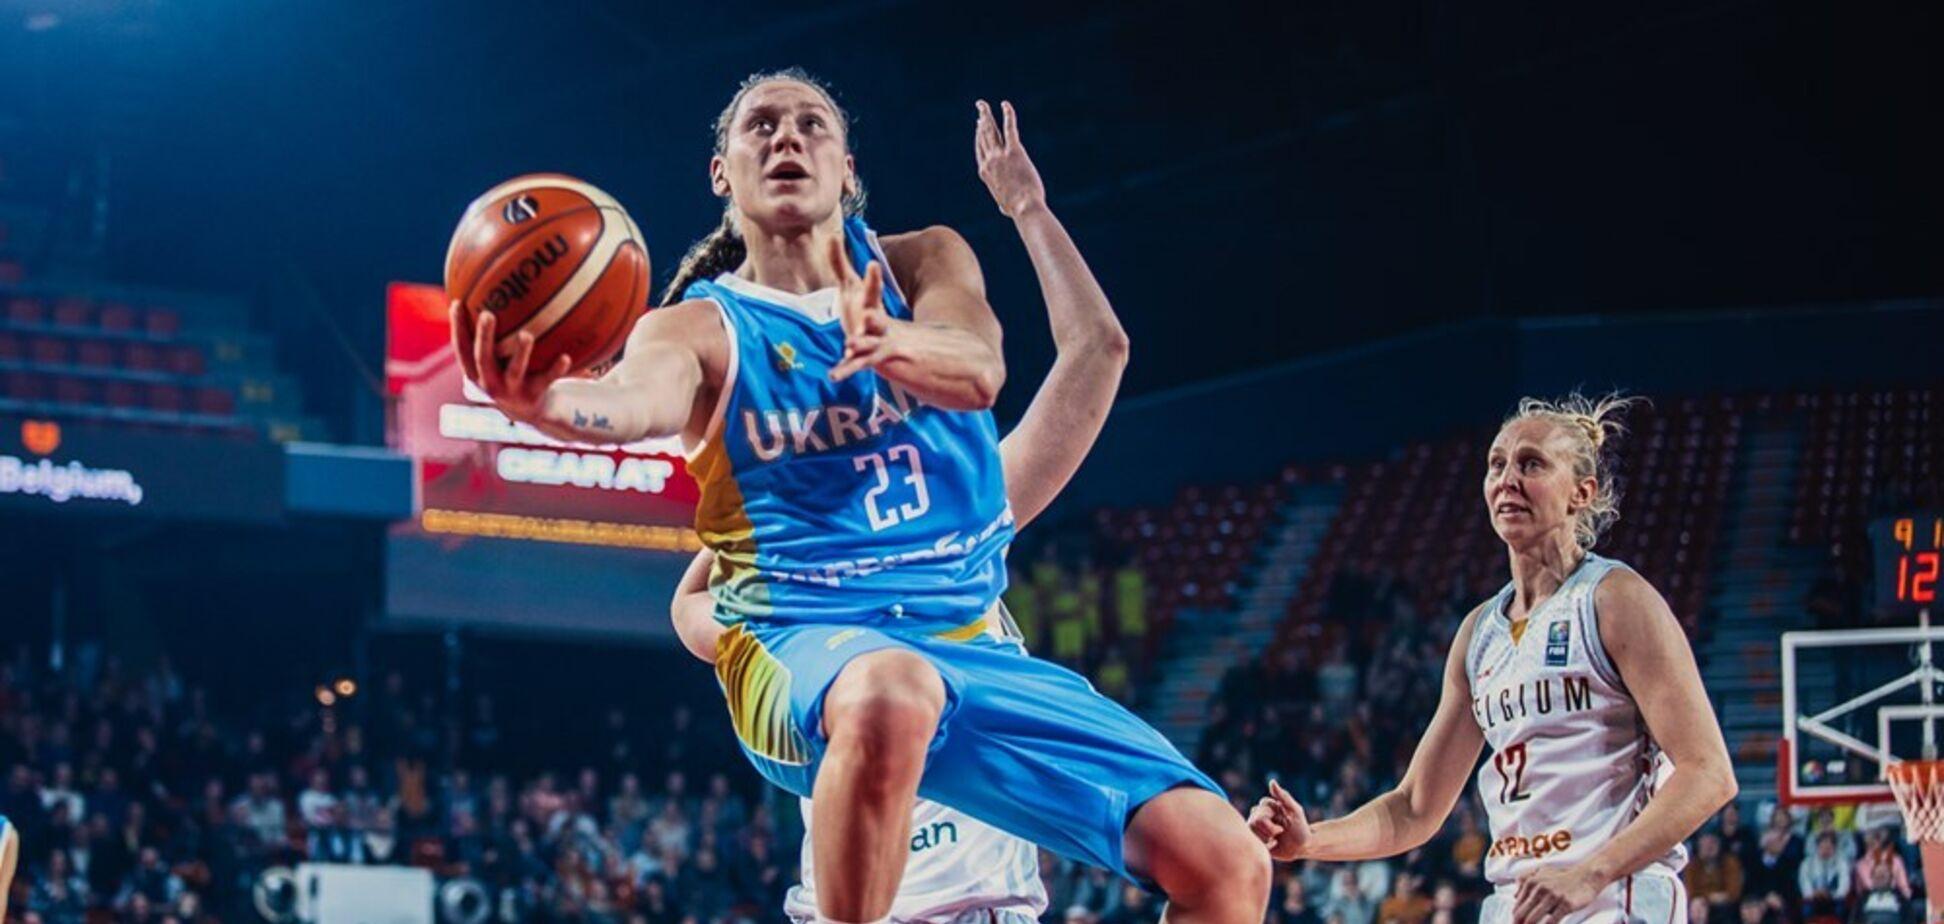 Украинка Ягупова стала лучшим бомбардиром первого тура отбора Евробаскета